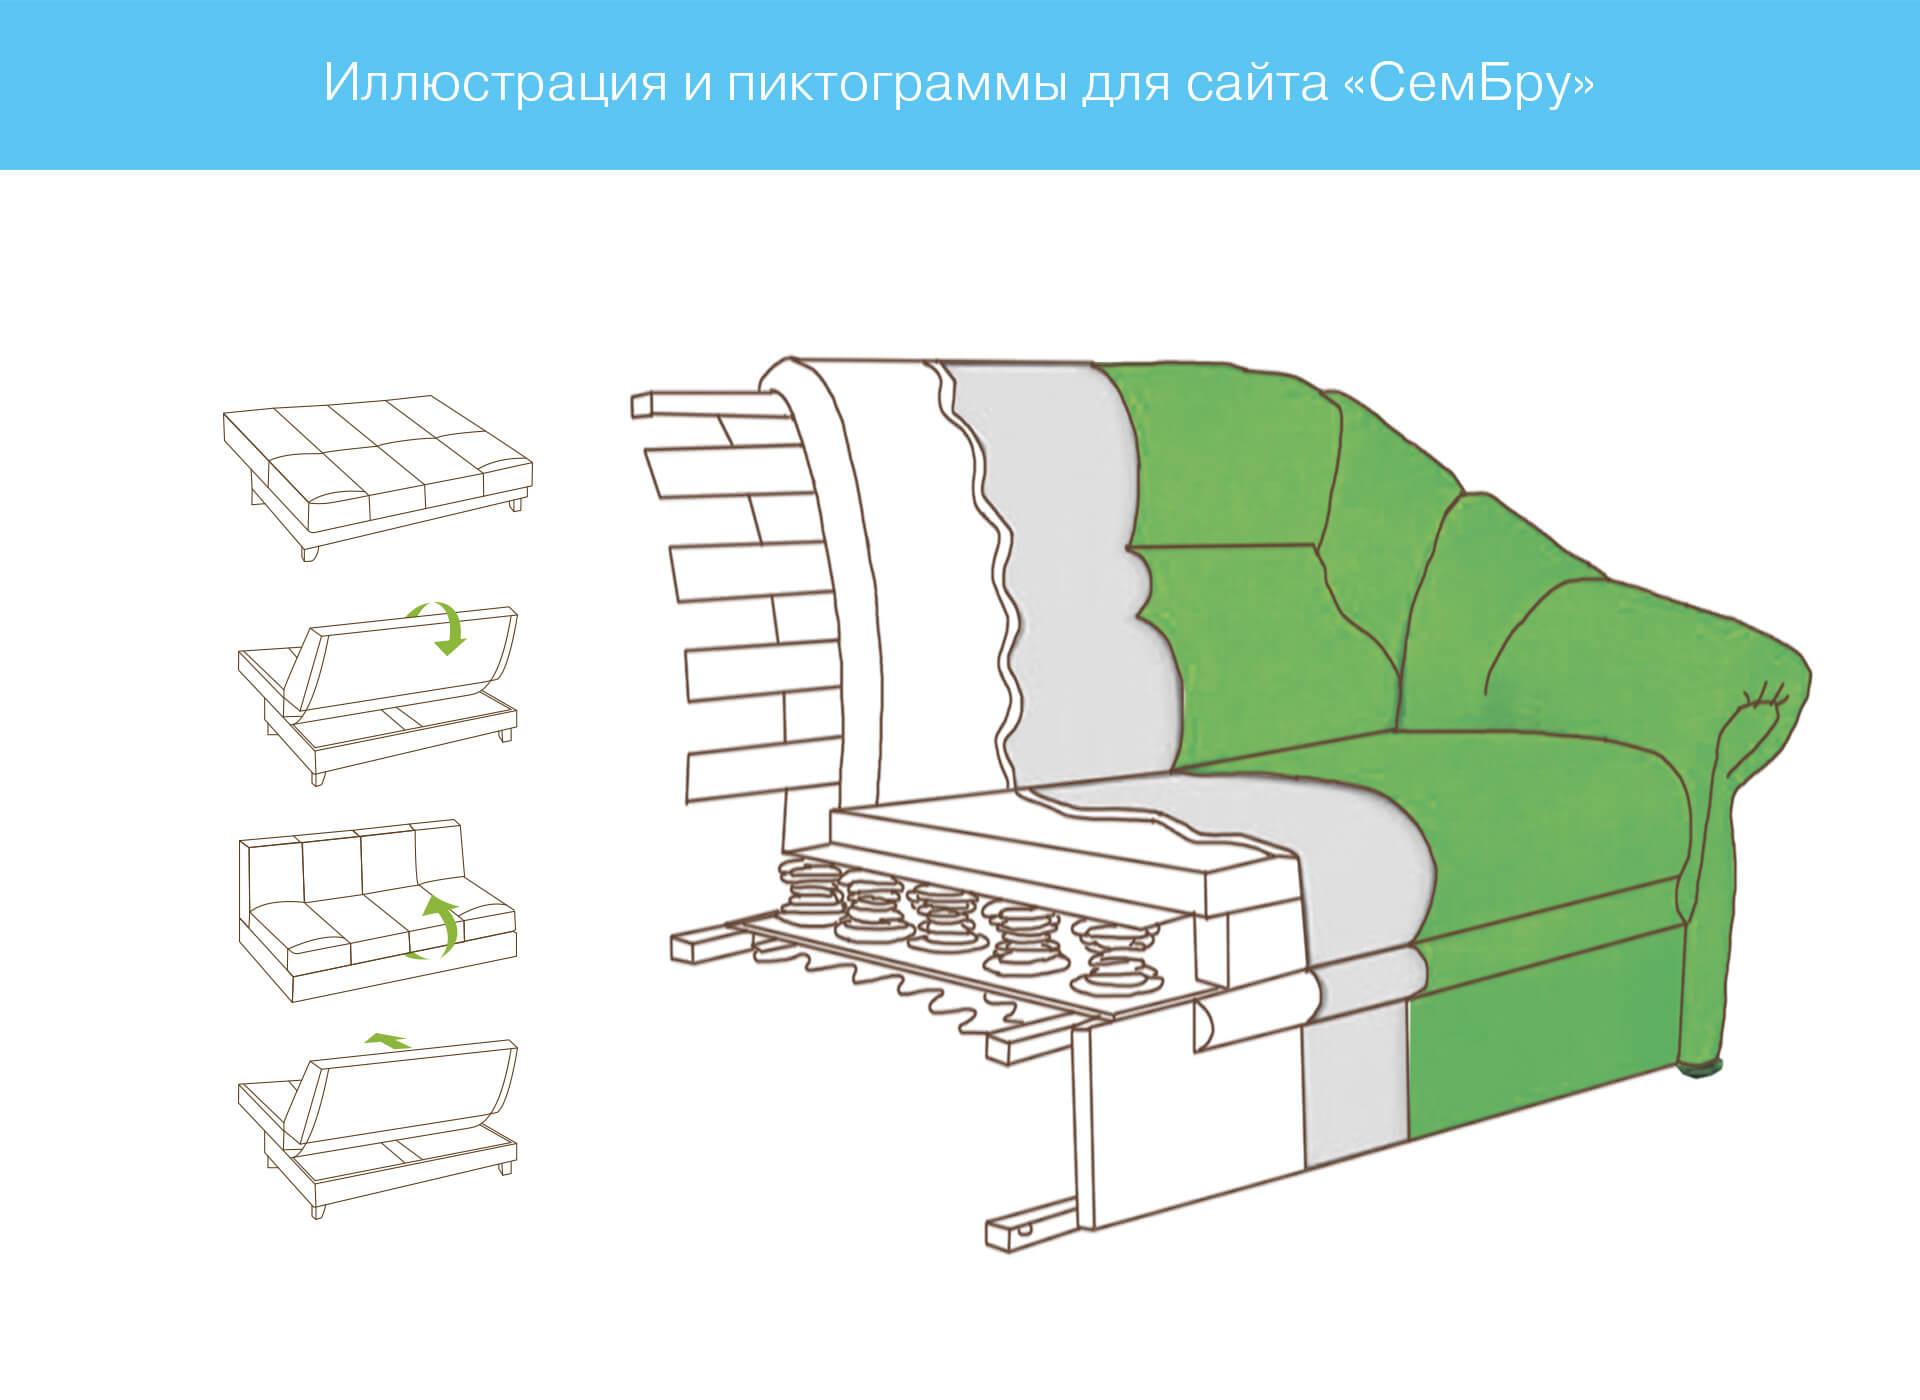 Prokochuk_Irina_logo_website design_SemBru_7